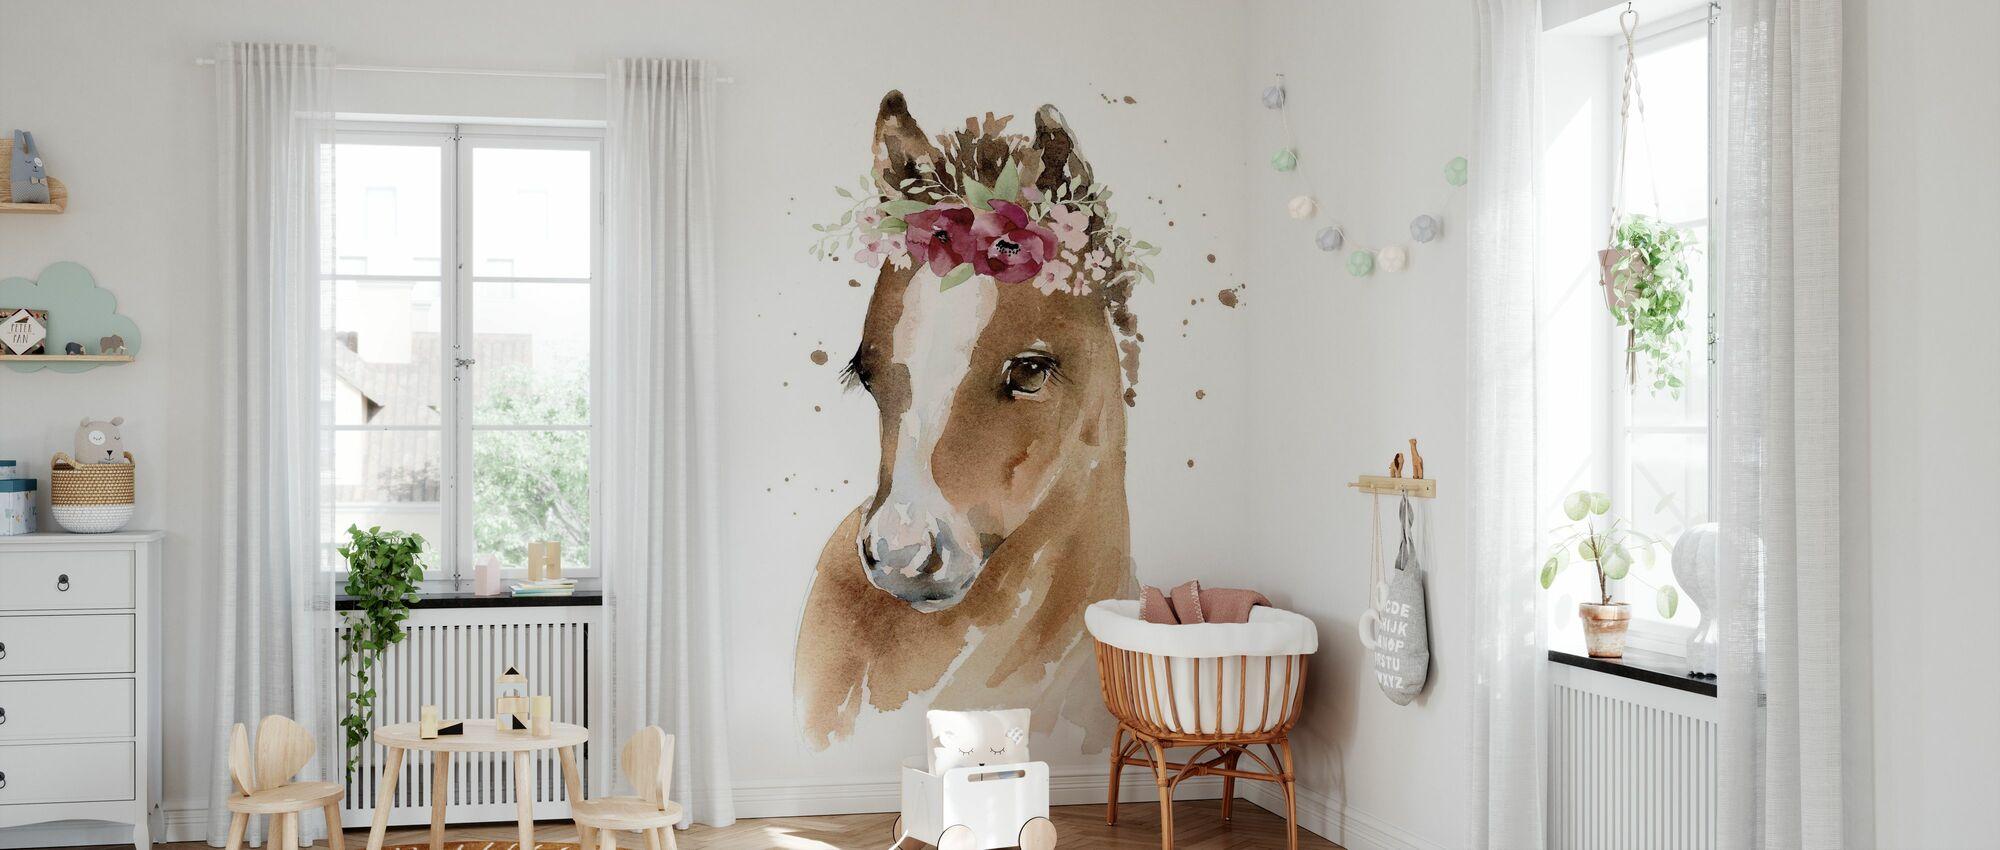 Floral Pony - Wallpaper - Nursery